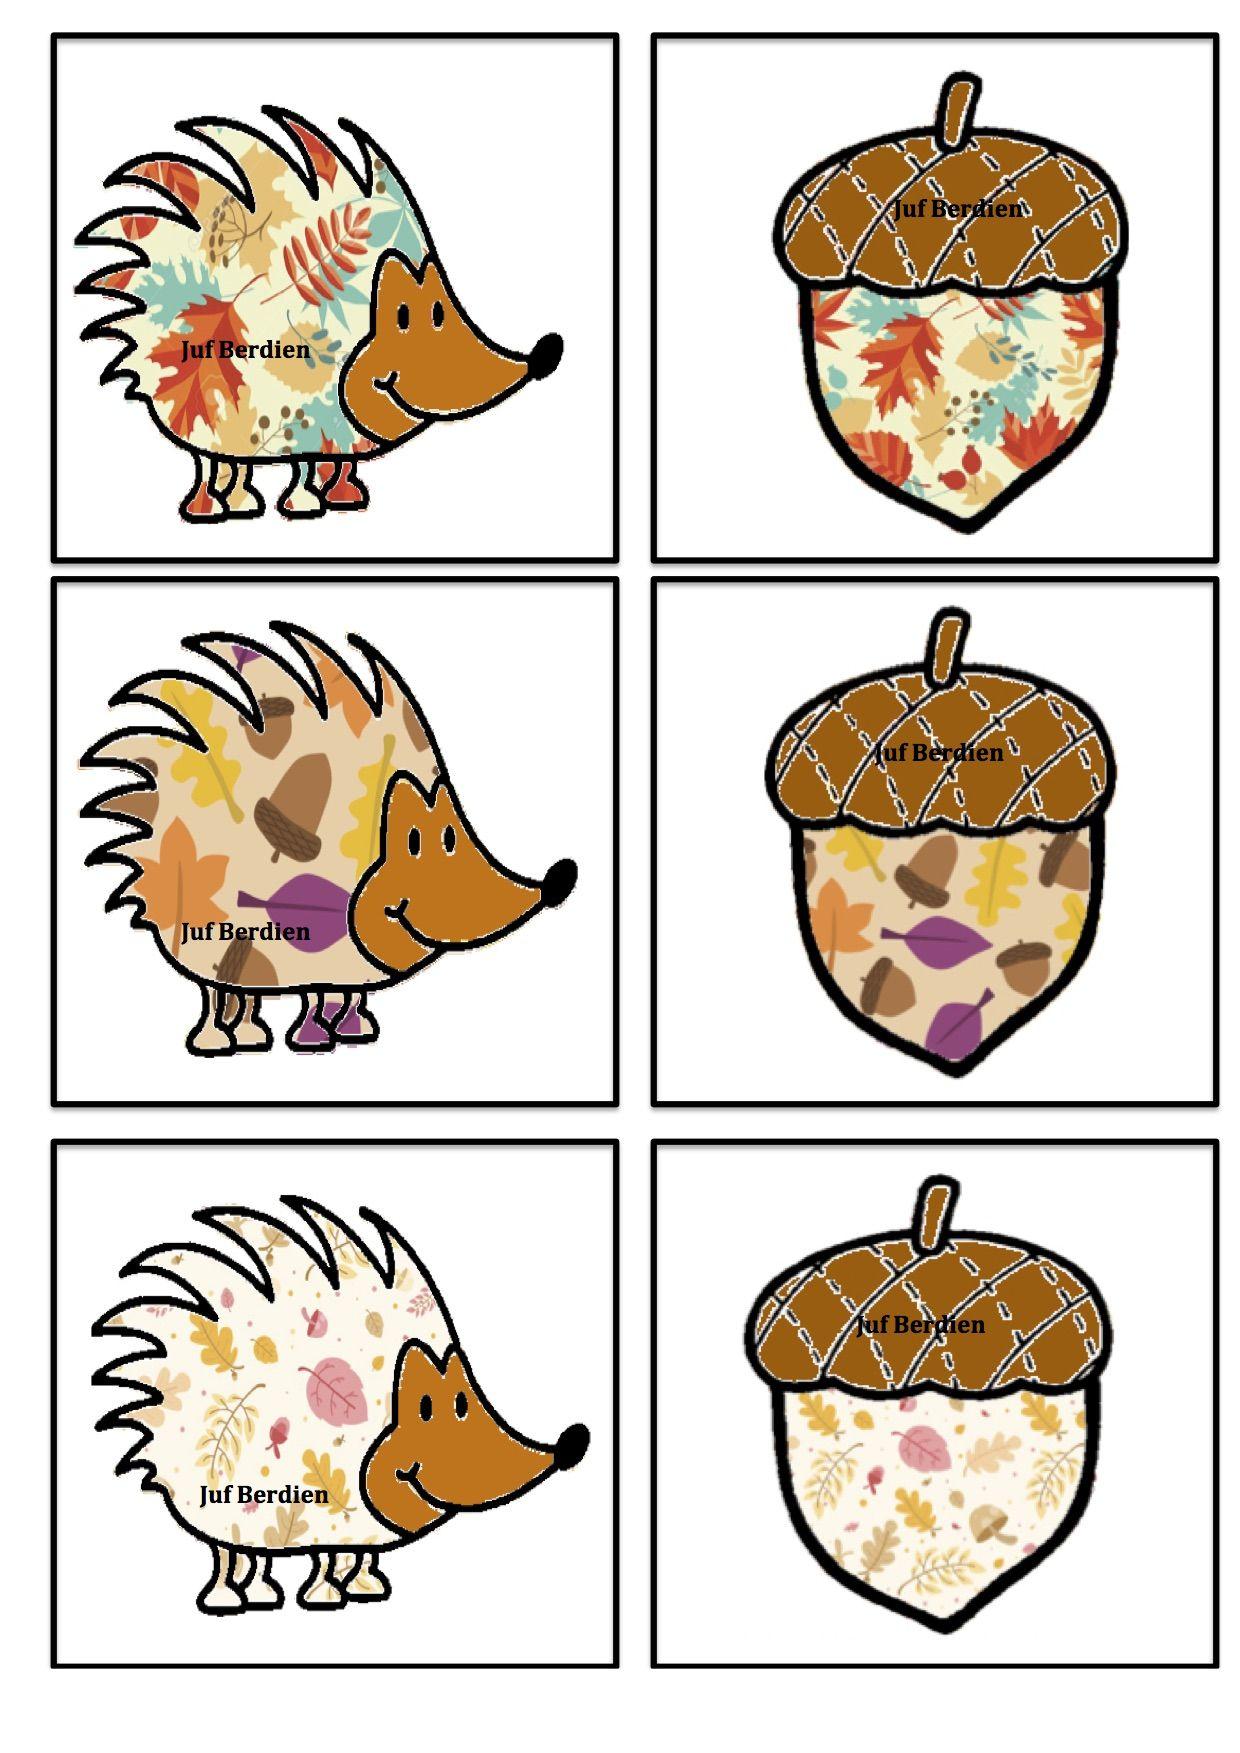 Quatang Gallery- Egel Memory Patroon 2 Juf Berdien Thema Herfst Herfstdieren Volledige Spel Facebookgroep Juf Berdien Egels Egel Knutselen En Herfst Knutselen